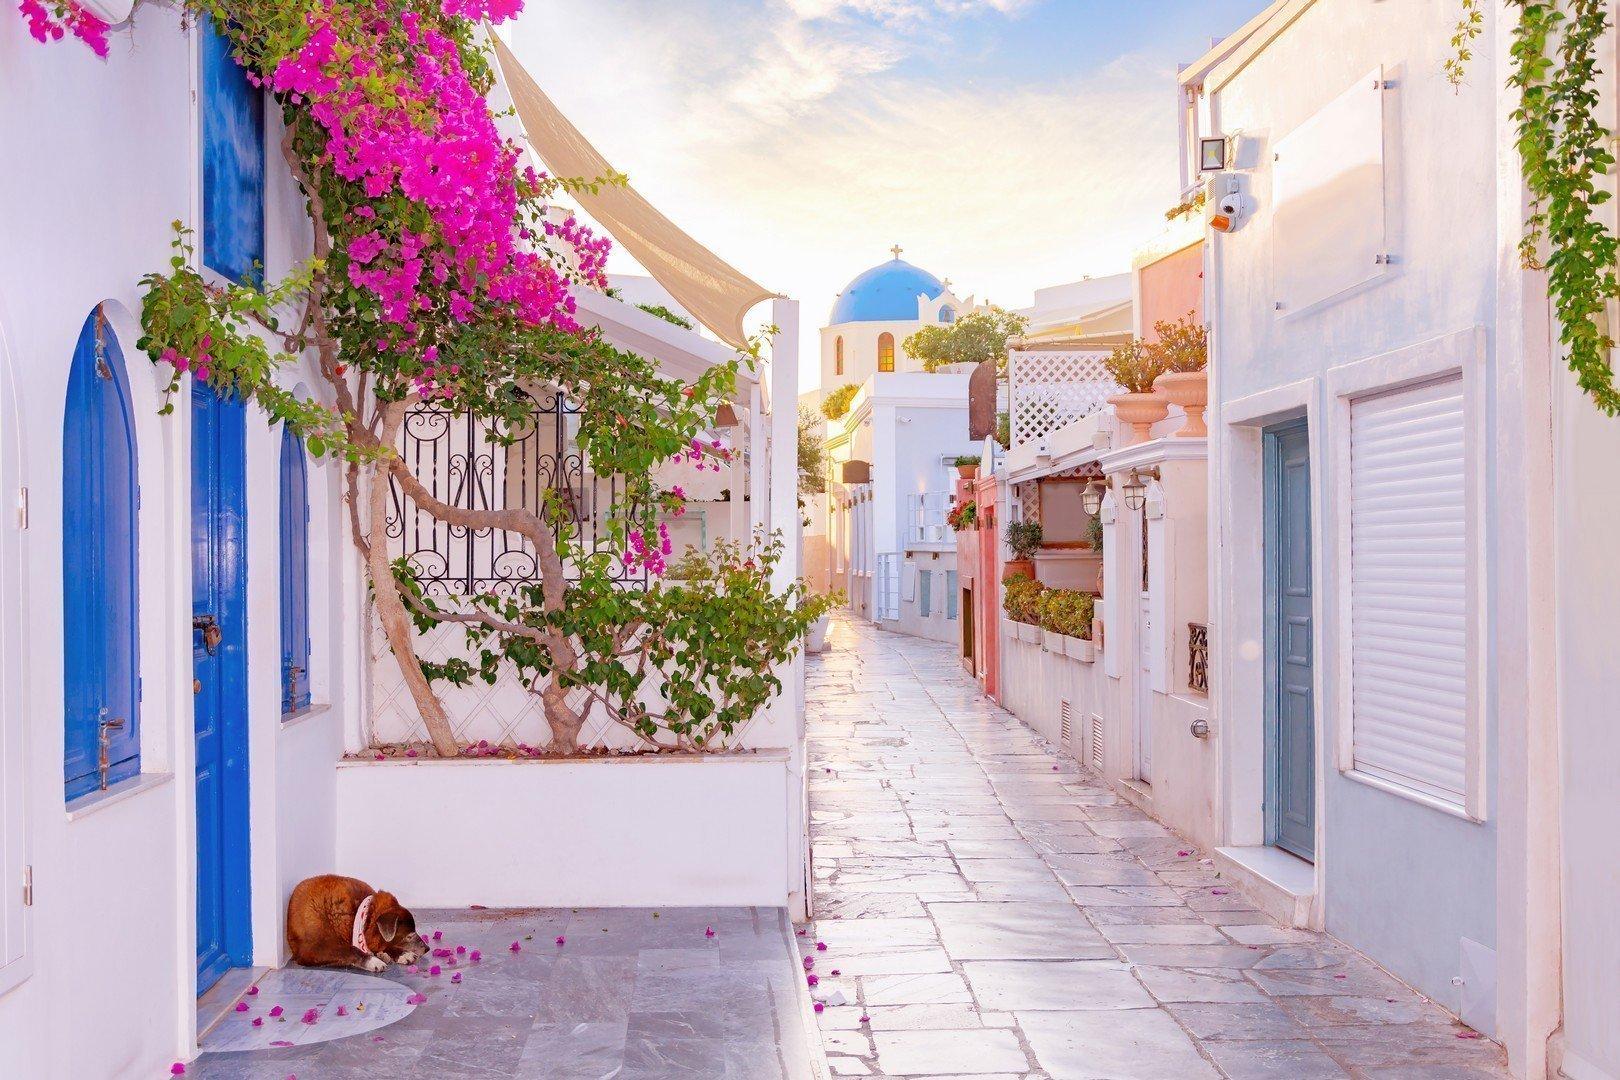 Un paseo por las calles estrechas de Santorini